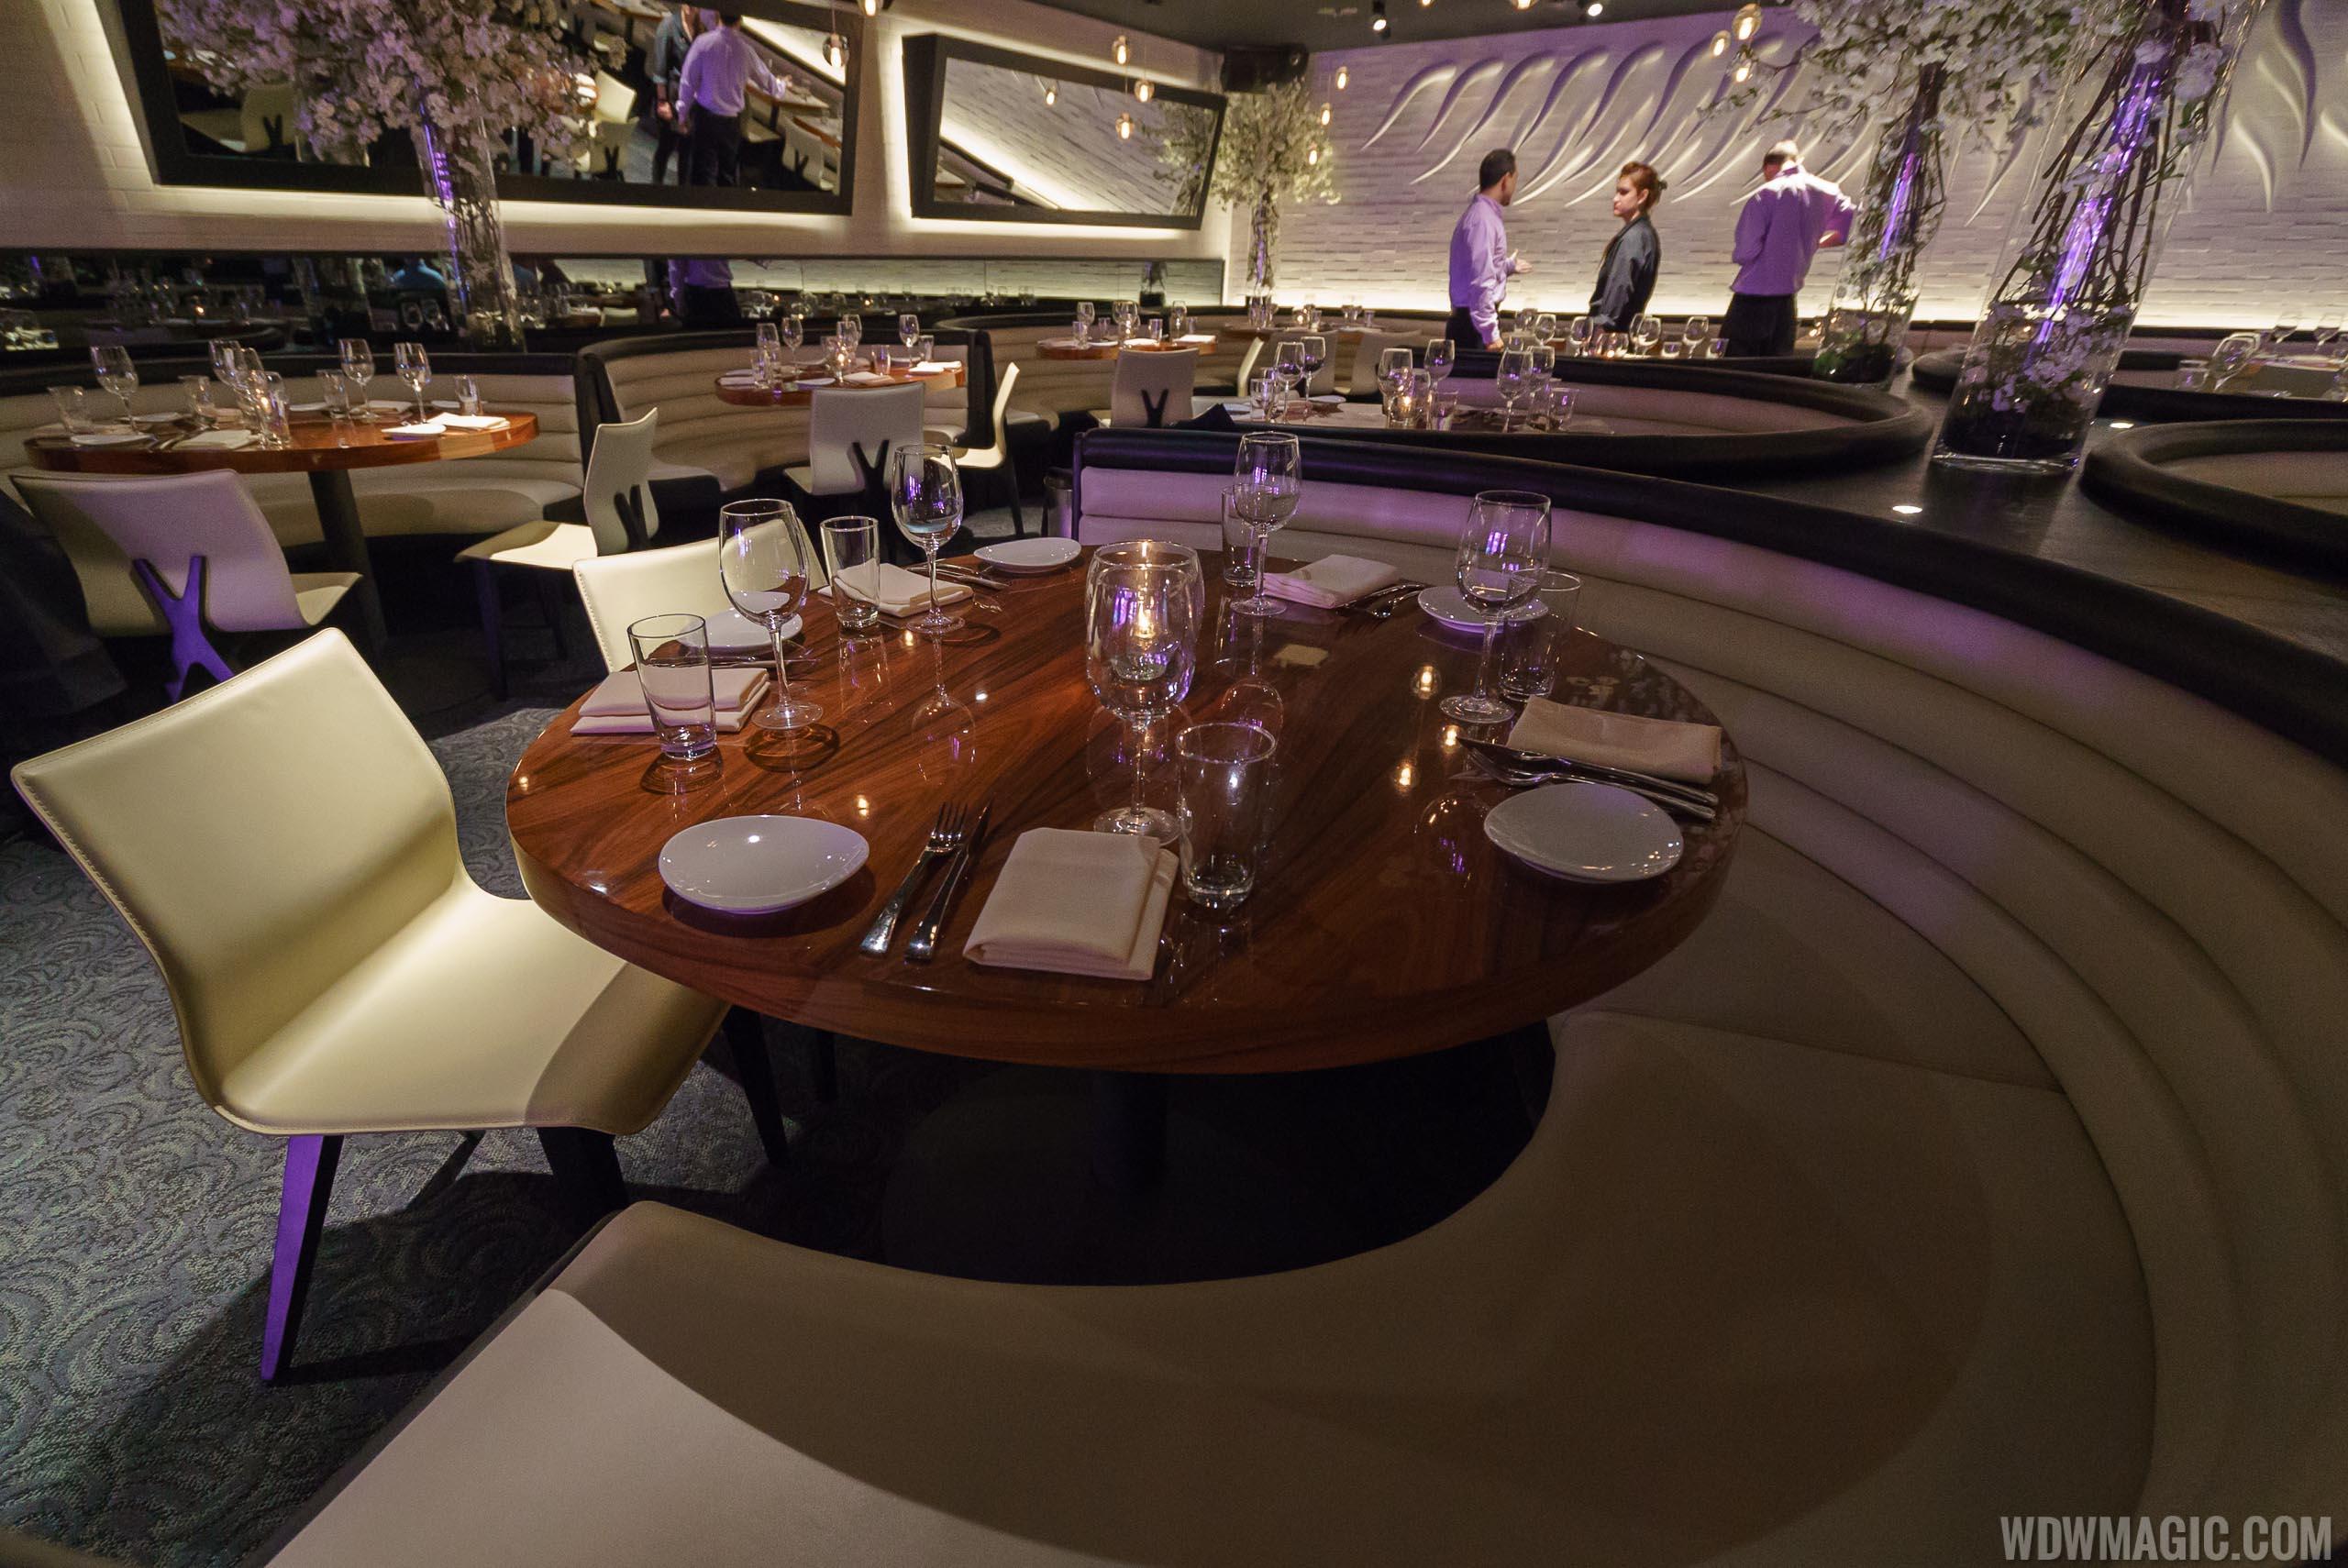 STK Orlando - Main dining room on lower level